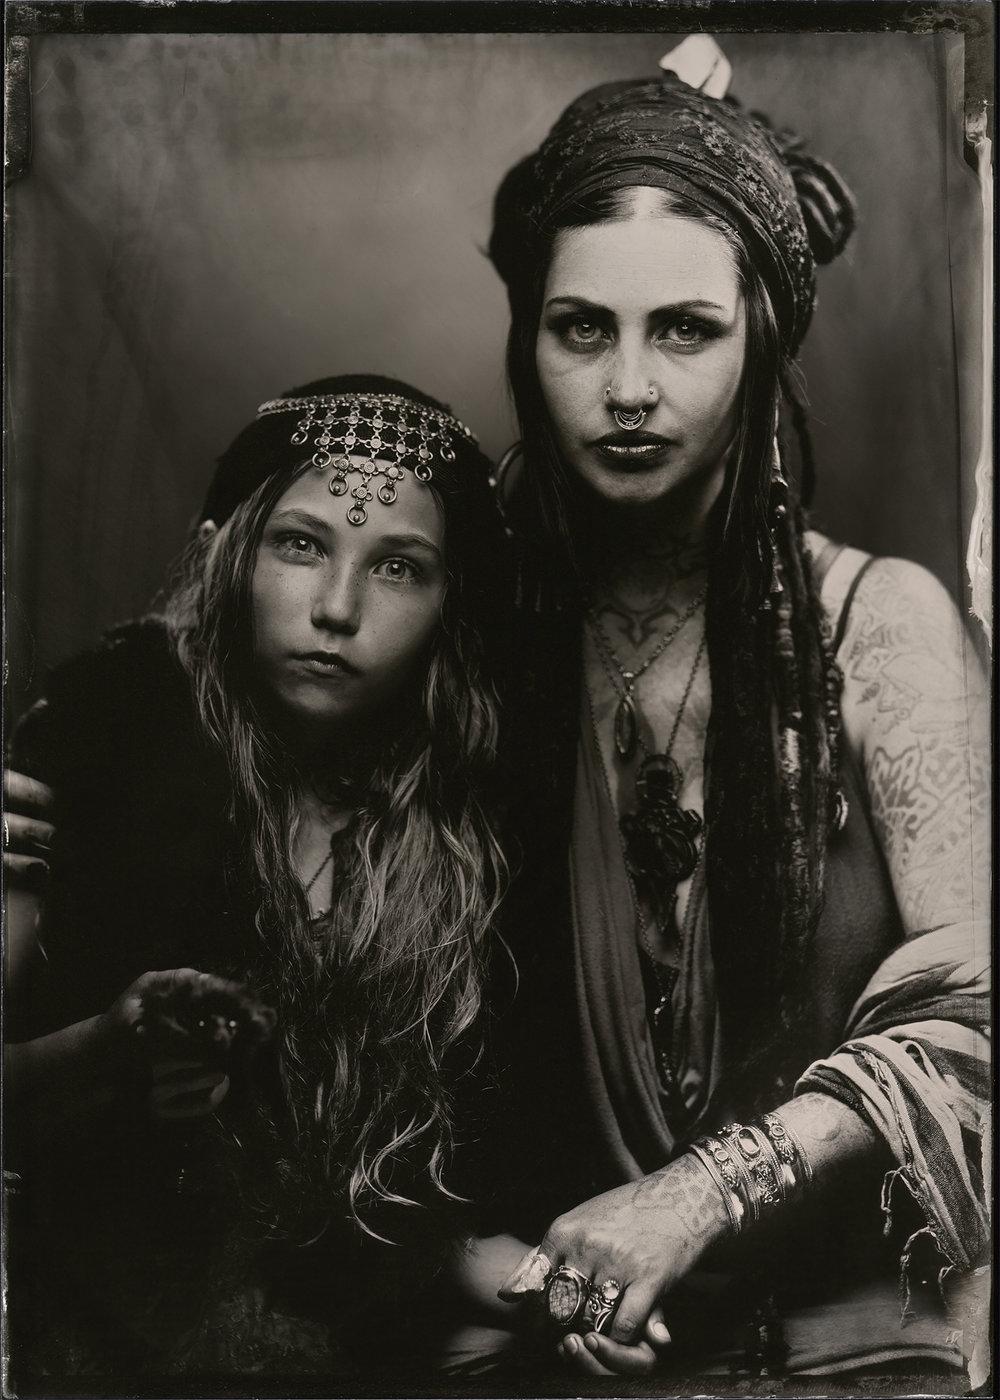 Bree&Violet_1200x1680.jpg